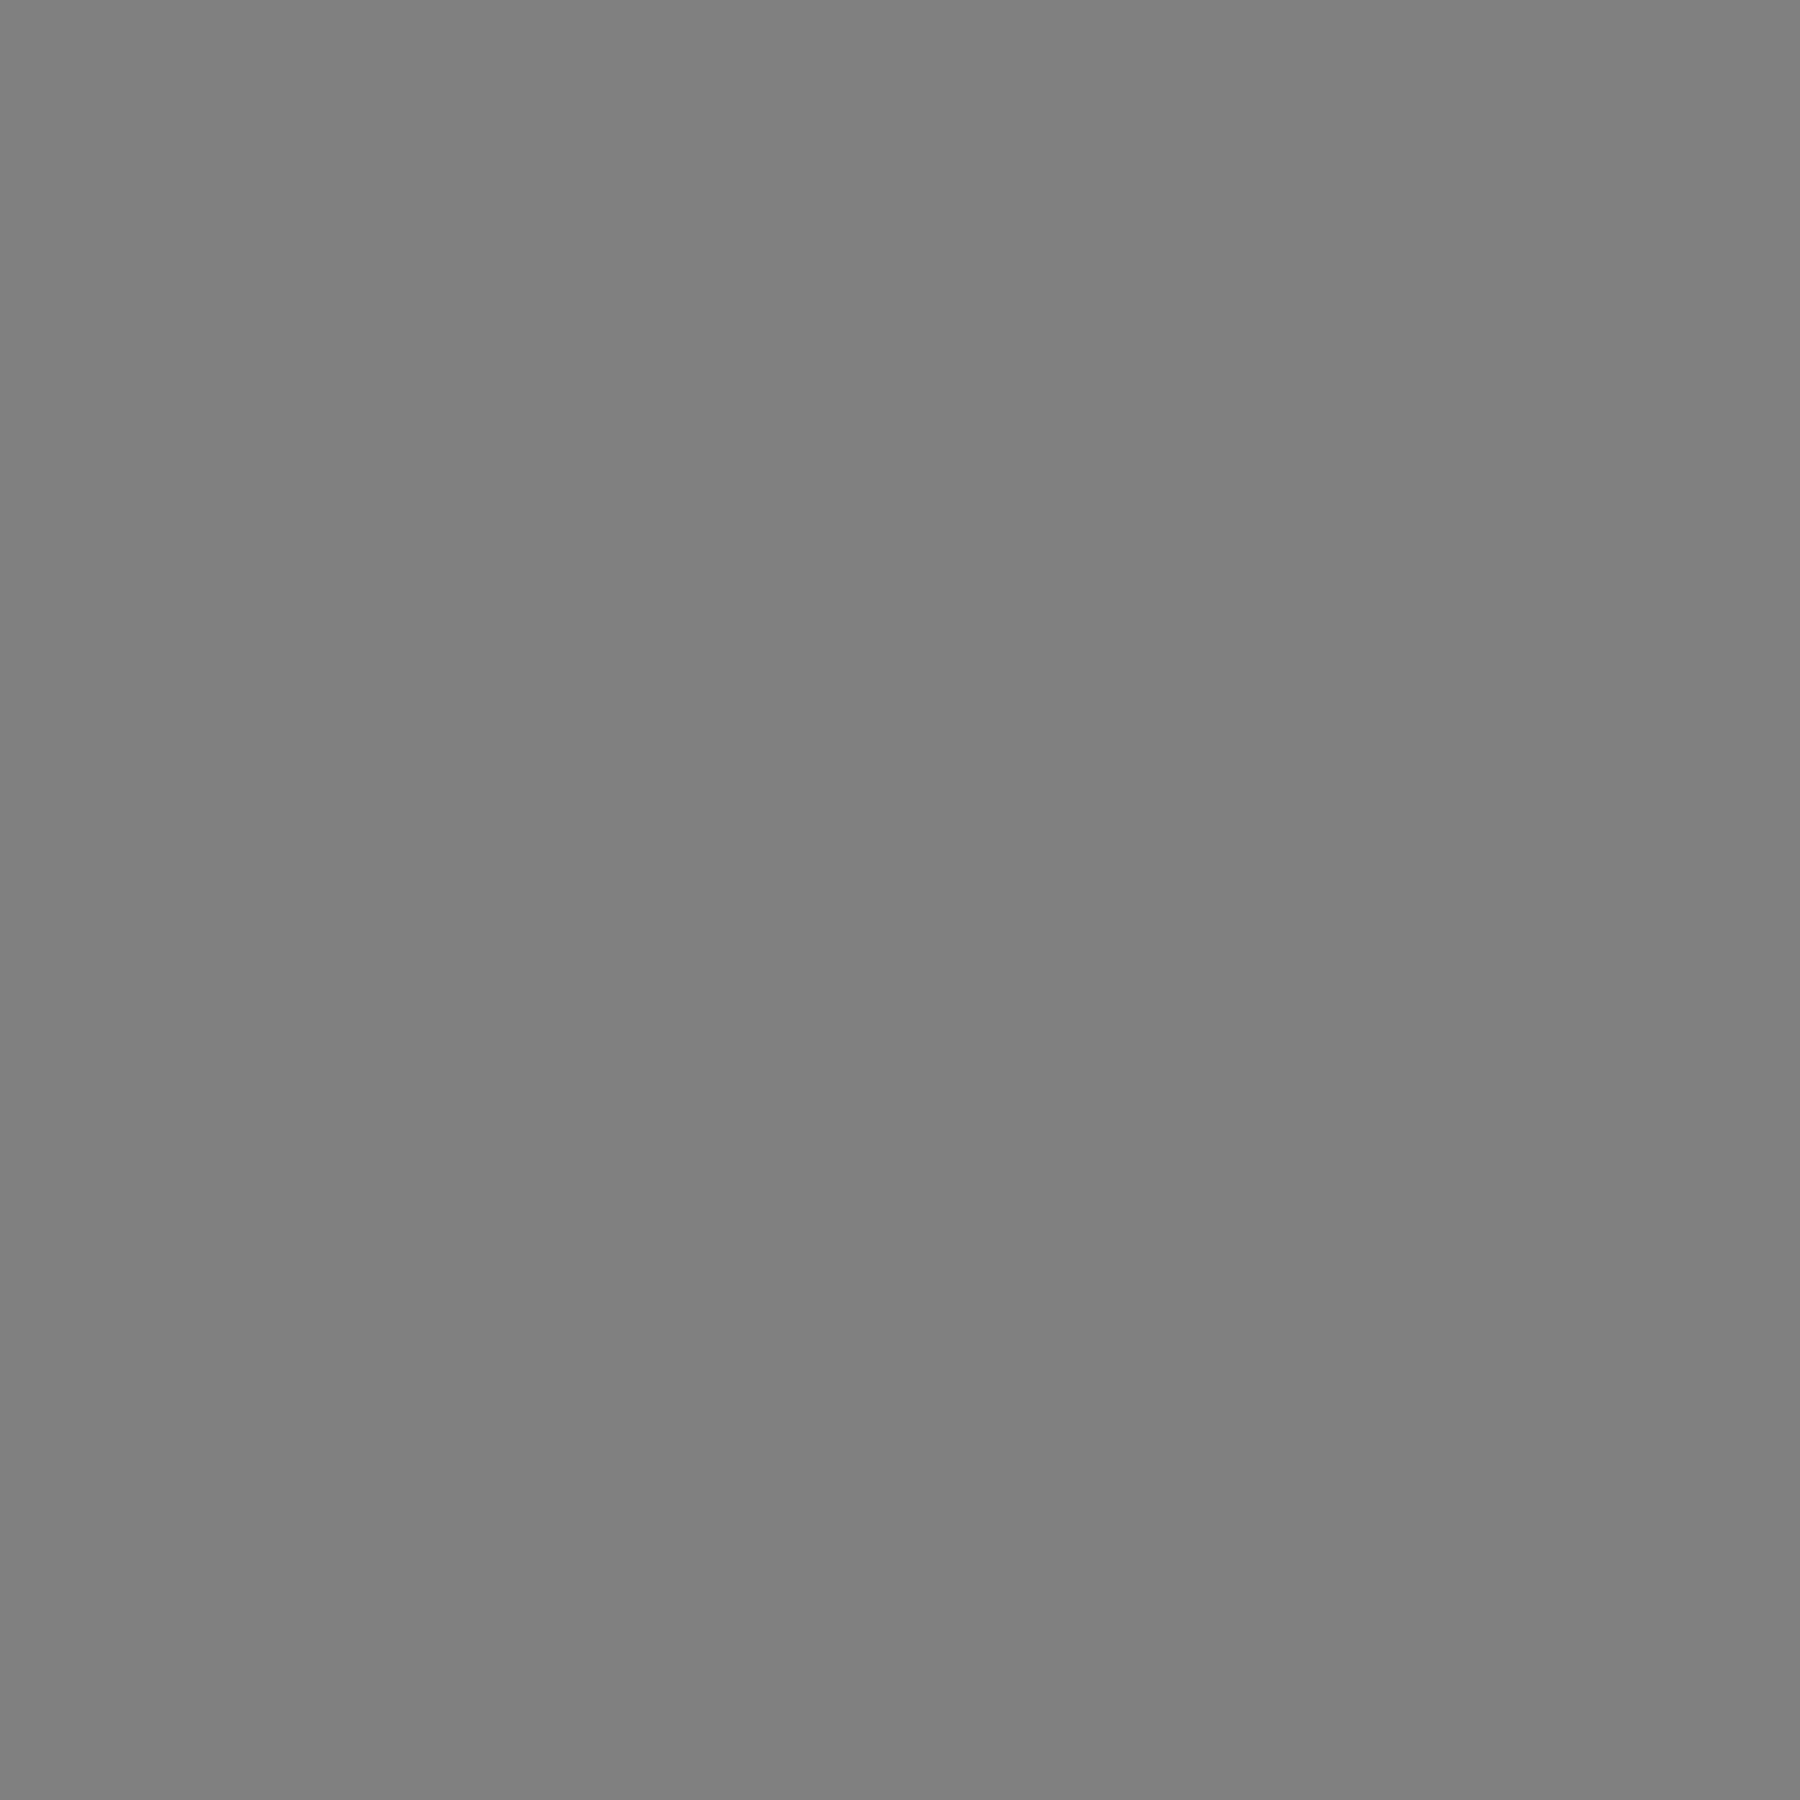 portait placeholder 8.jpg